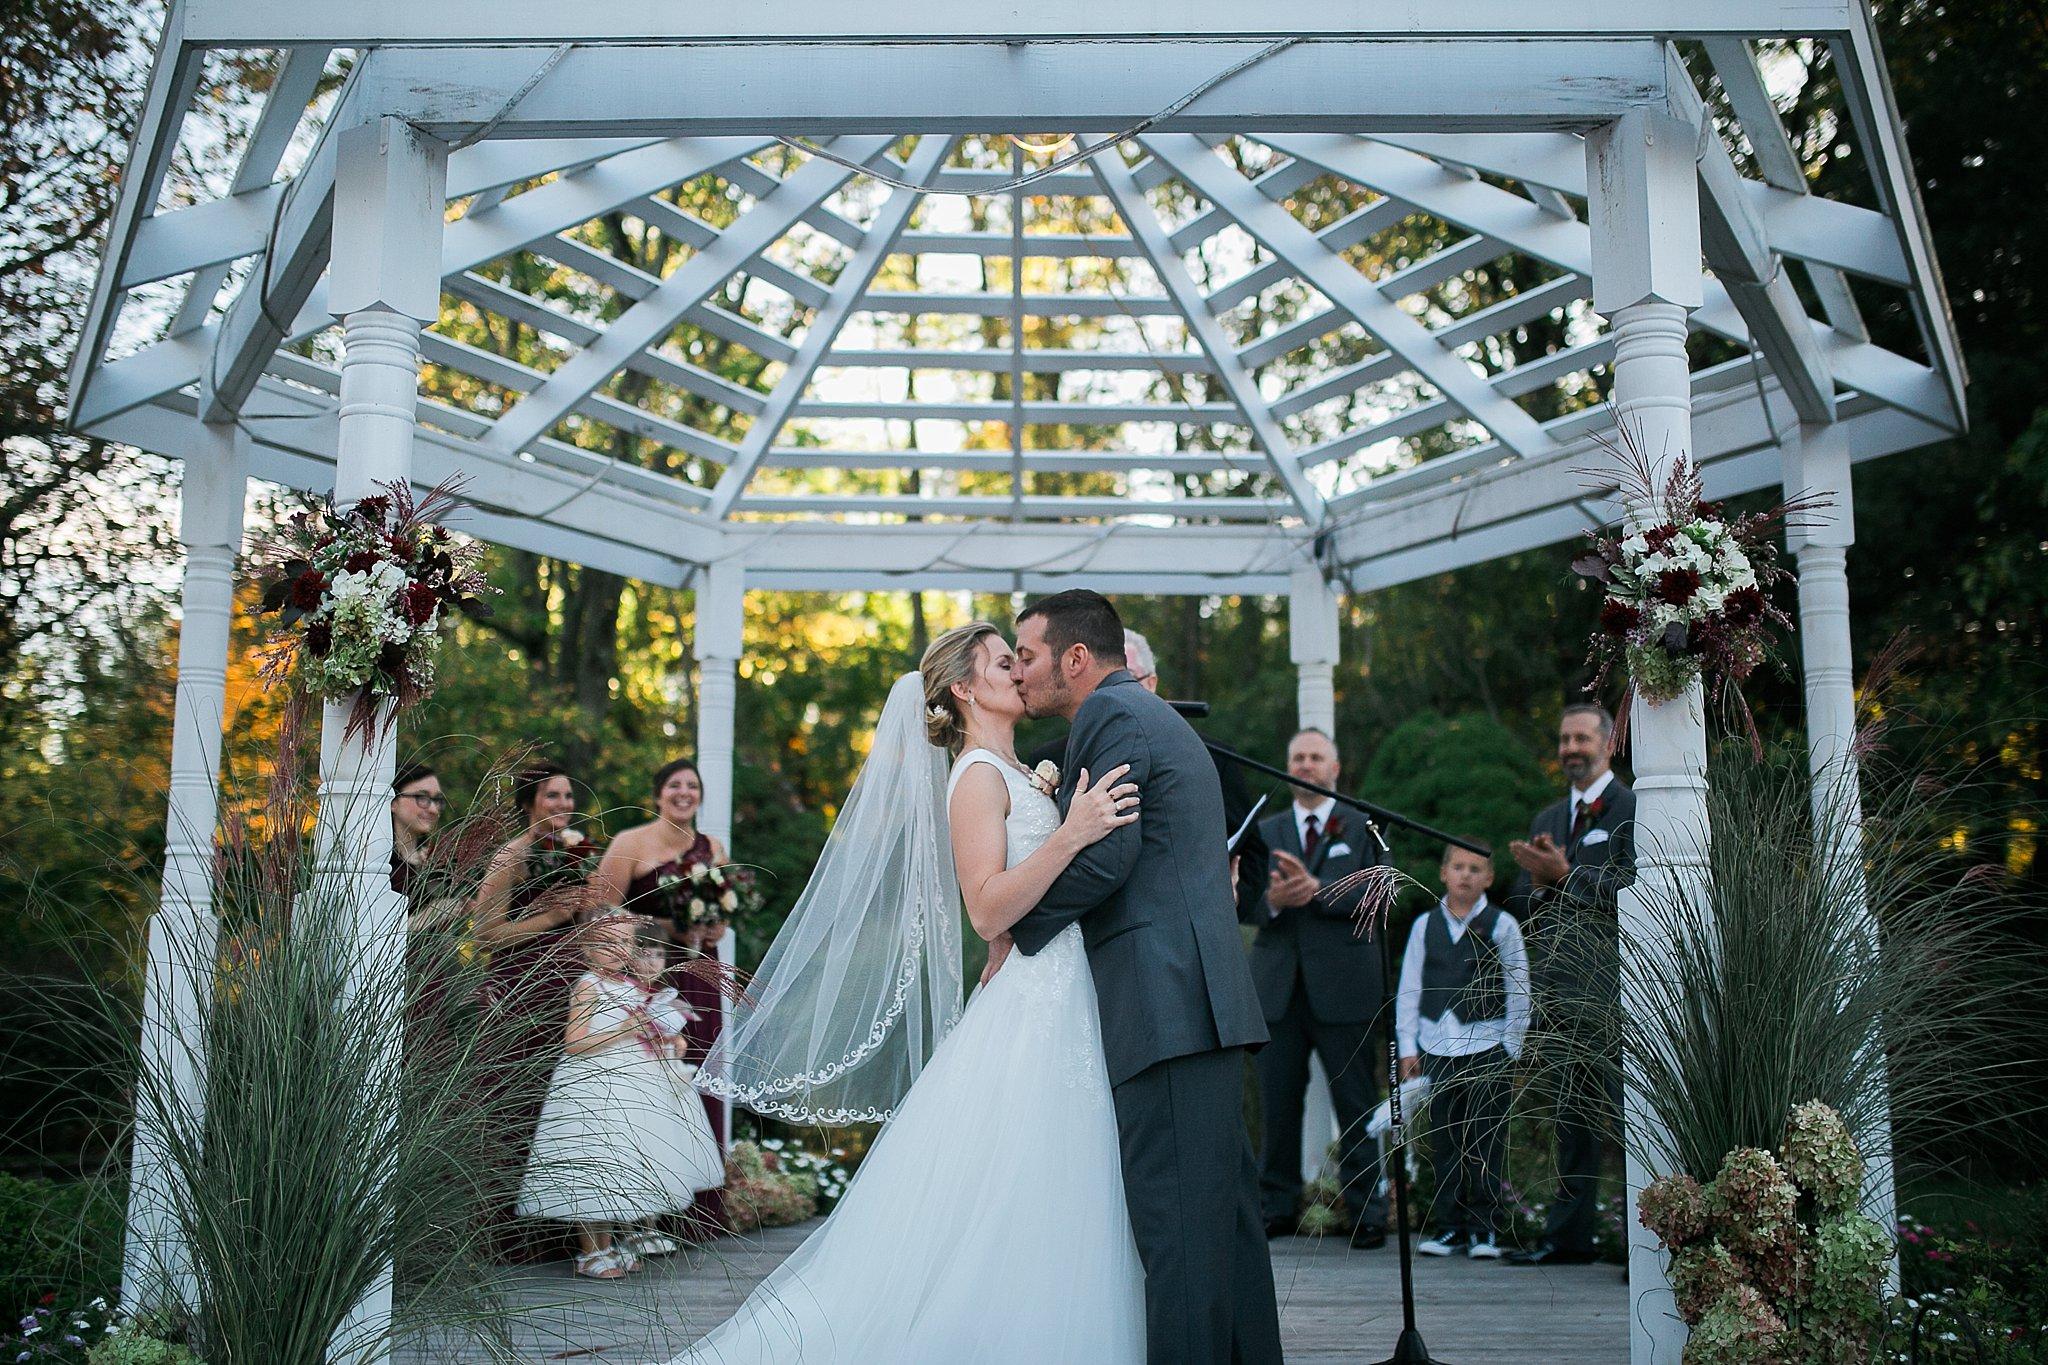 New Windsor New York Hudson Valley New York Wedding Photographer 47.jpg